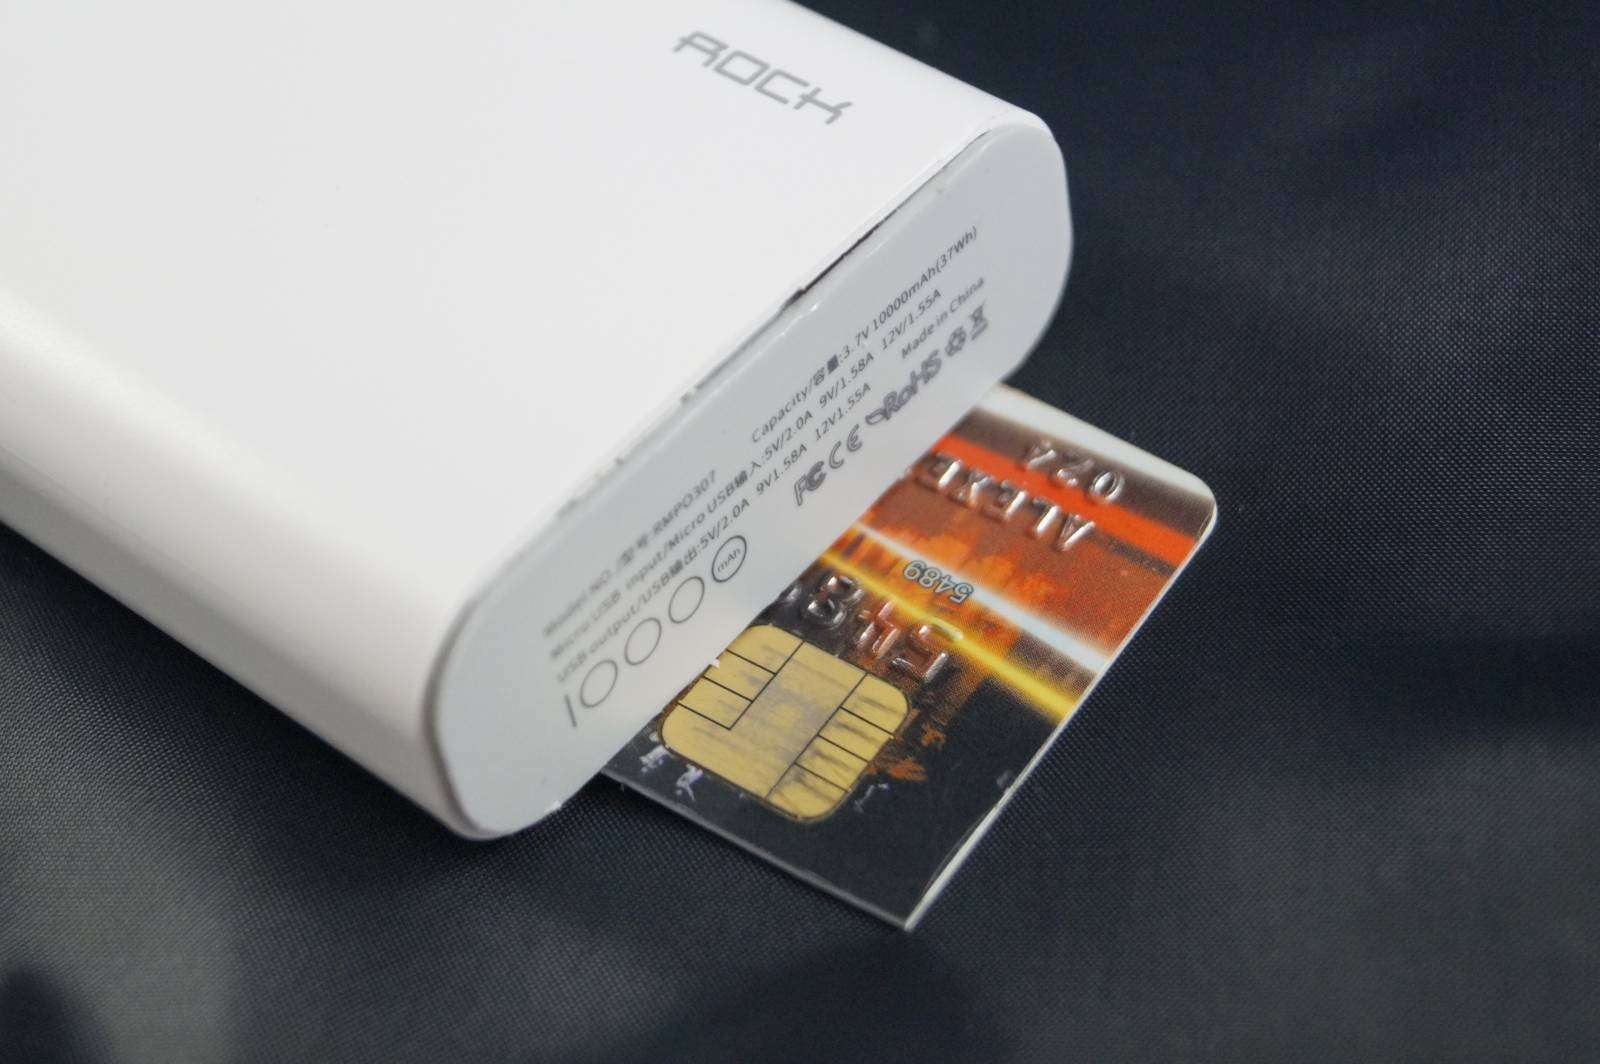 Aliexpress: Power bank ROCK 10000 мАч с поддержкой QC 2.0